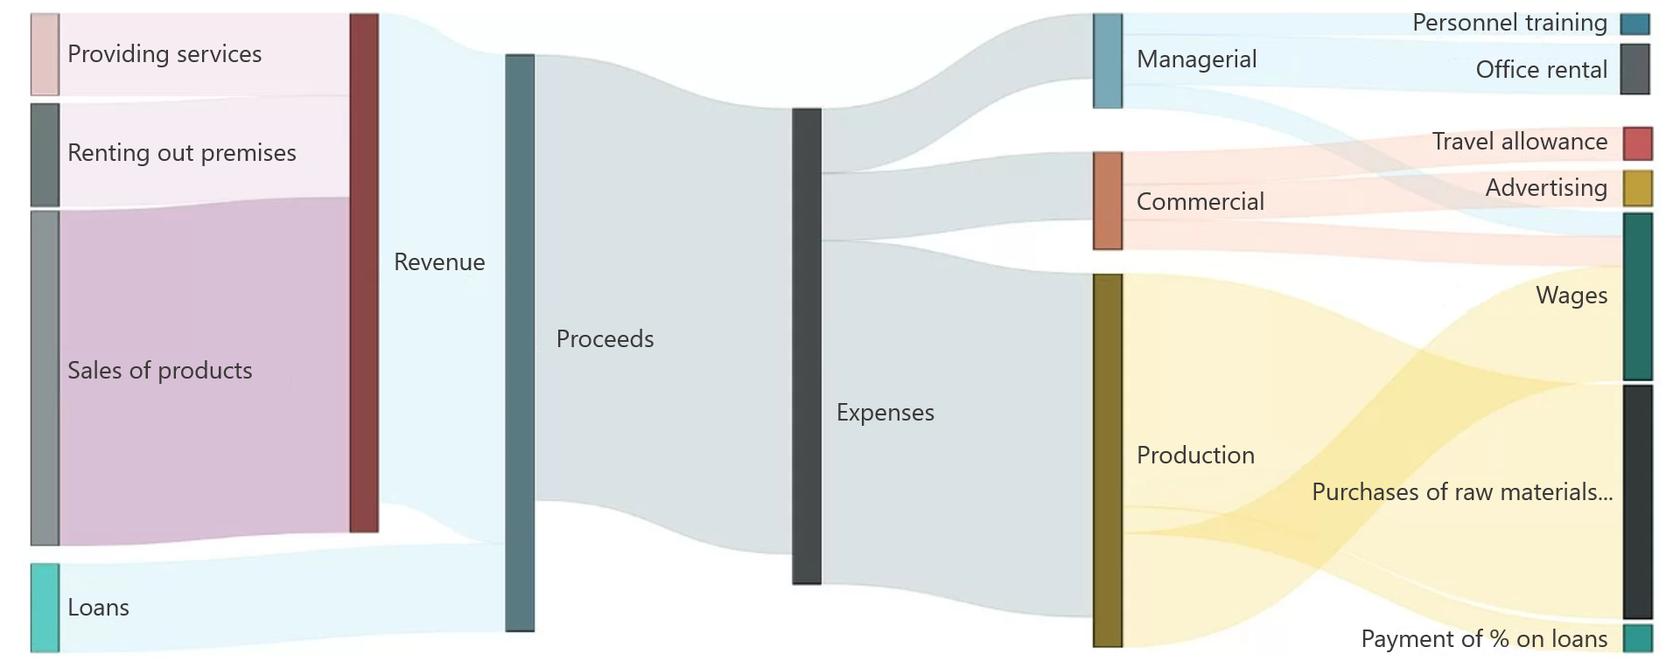 Creating Sankey Diagrams For Flow Visualization In Power Bi